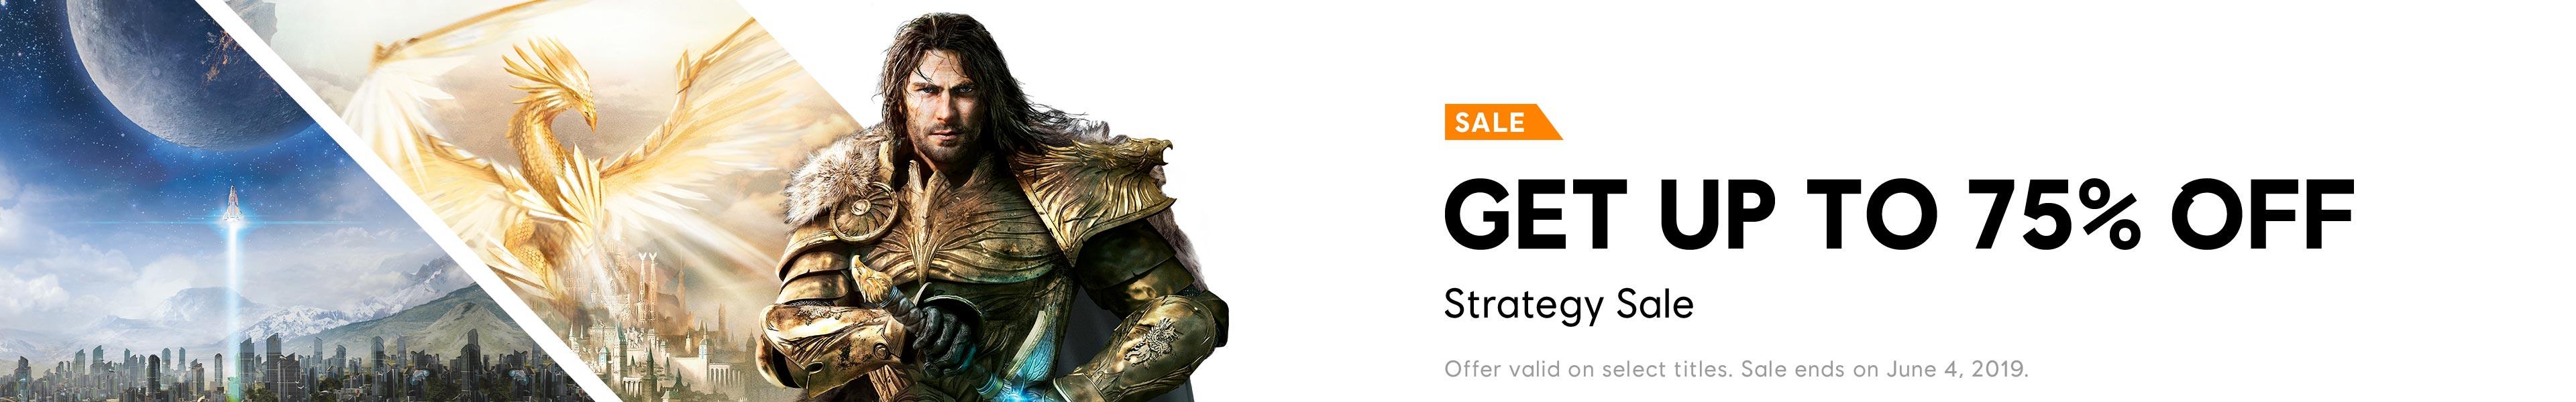 Fantasy Games Sale Category banner